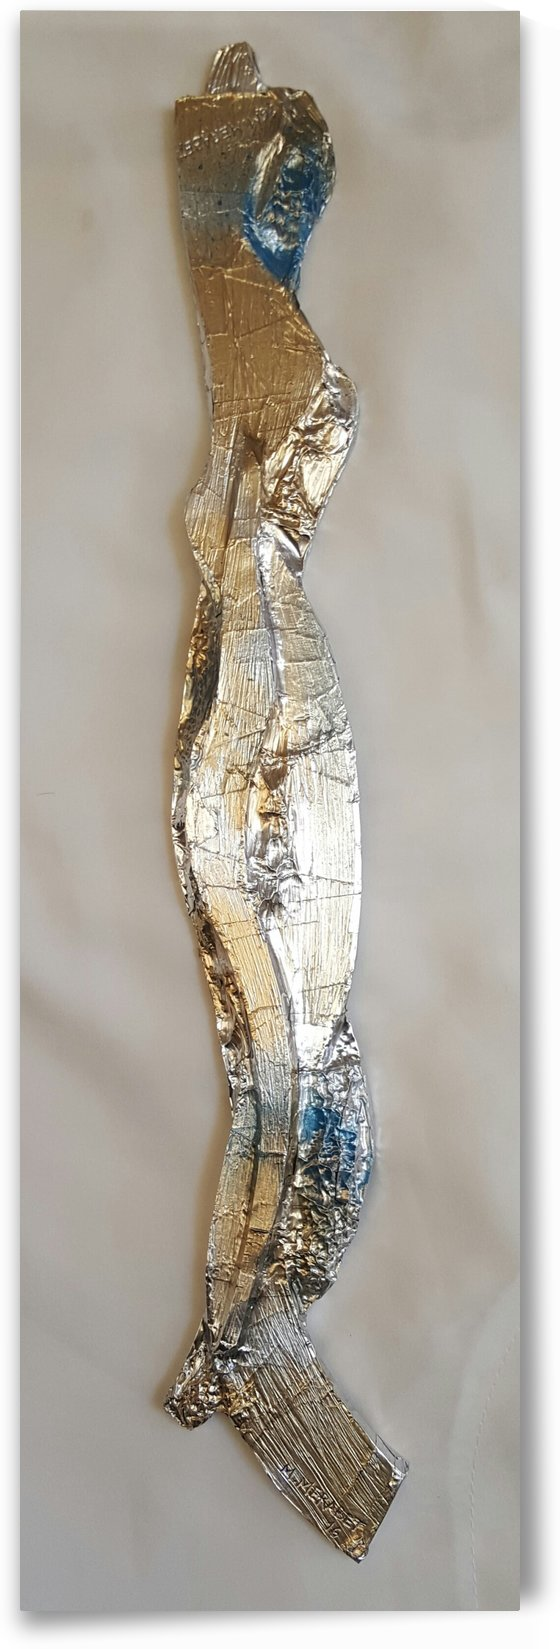 STYLISH LINEAR  2016  ALUMINIUM AND OIL GOLDEN AND ACRYLIC ON CARDBOARD  49_4. by Merabet Maamar